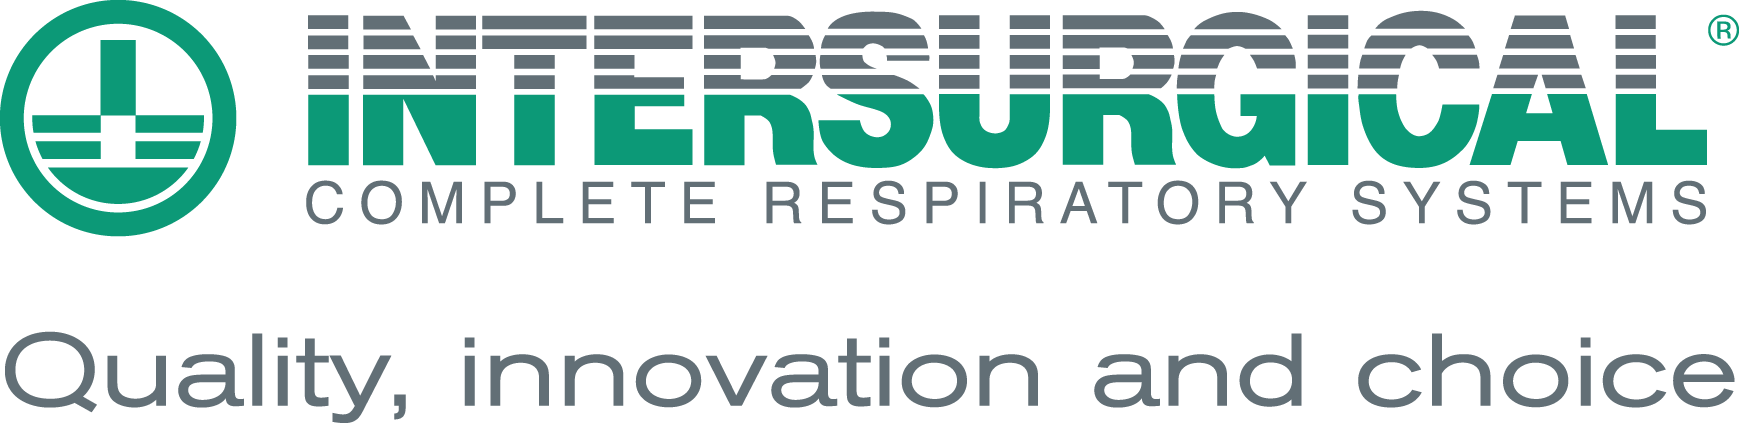 Intersurgical Australia Pty Ltd logo.png